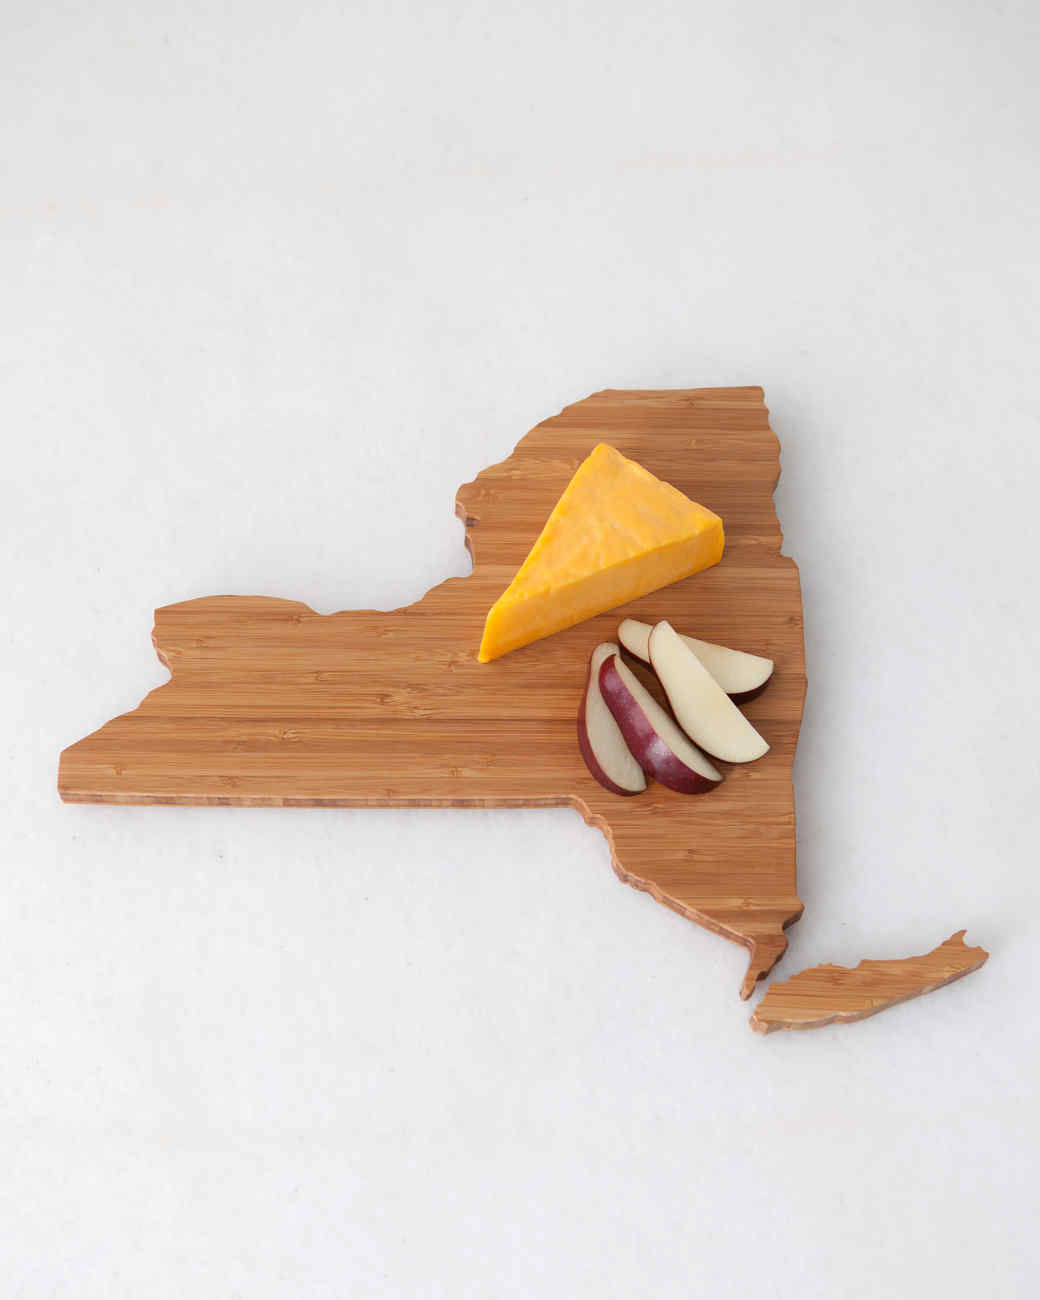 cheese-boards-d110478-0034r.jpg